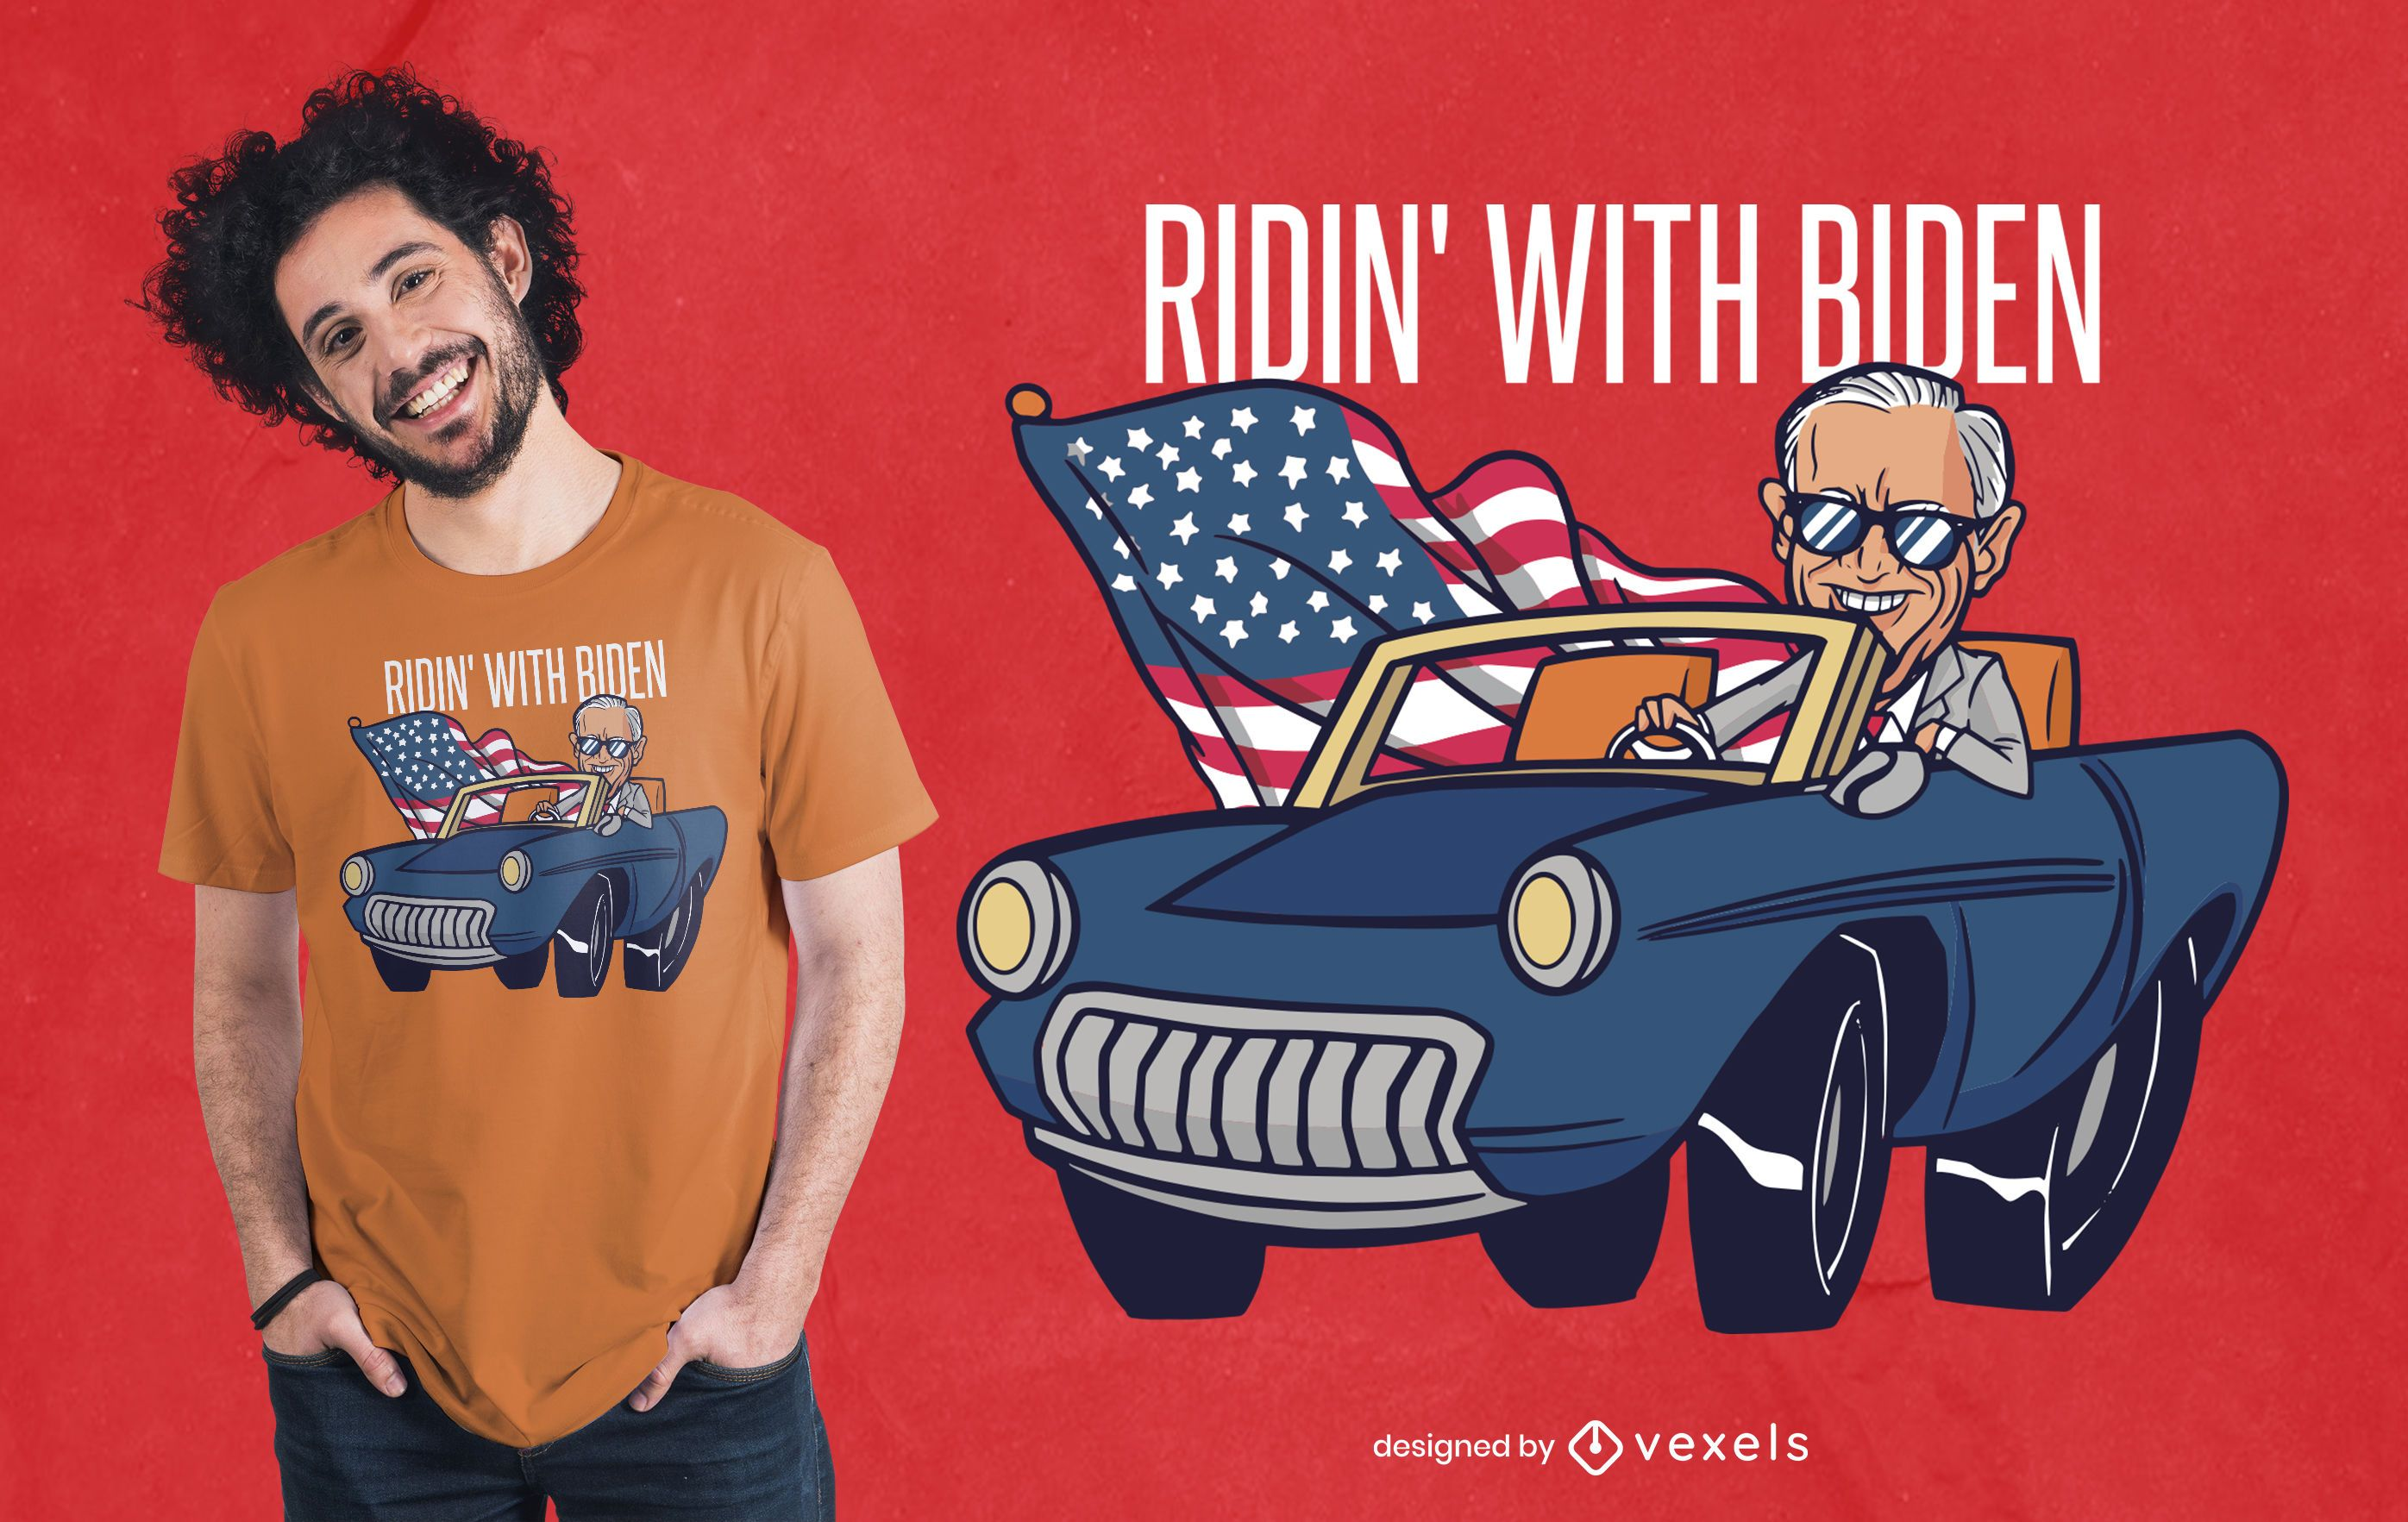 Riding With Biden T-shirt Design